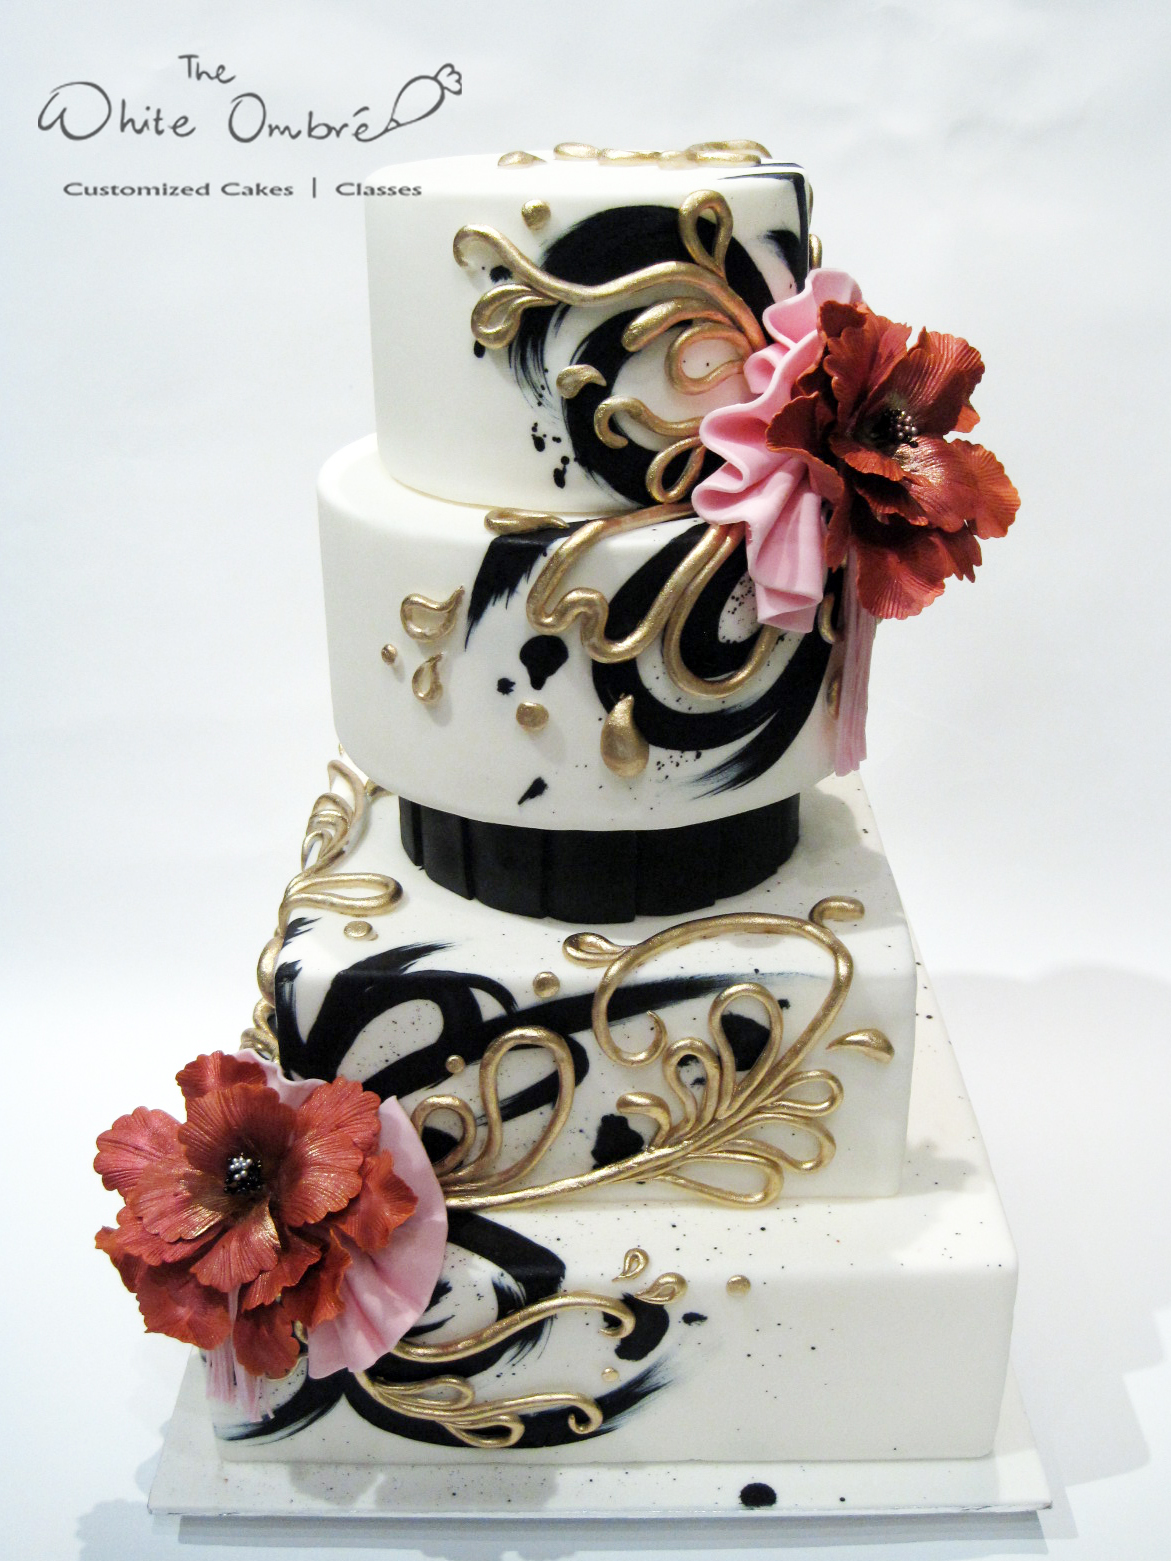 Nicholas-Ang-The-White-Ombre-Wedding-Elegant-1.JPG#asset:12136